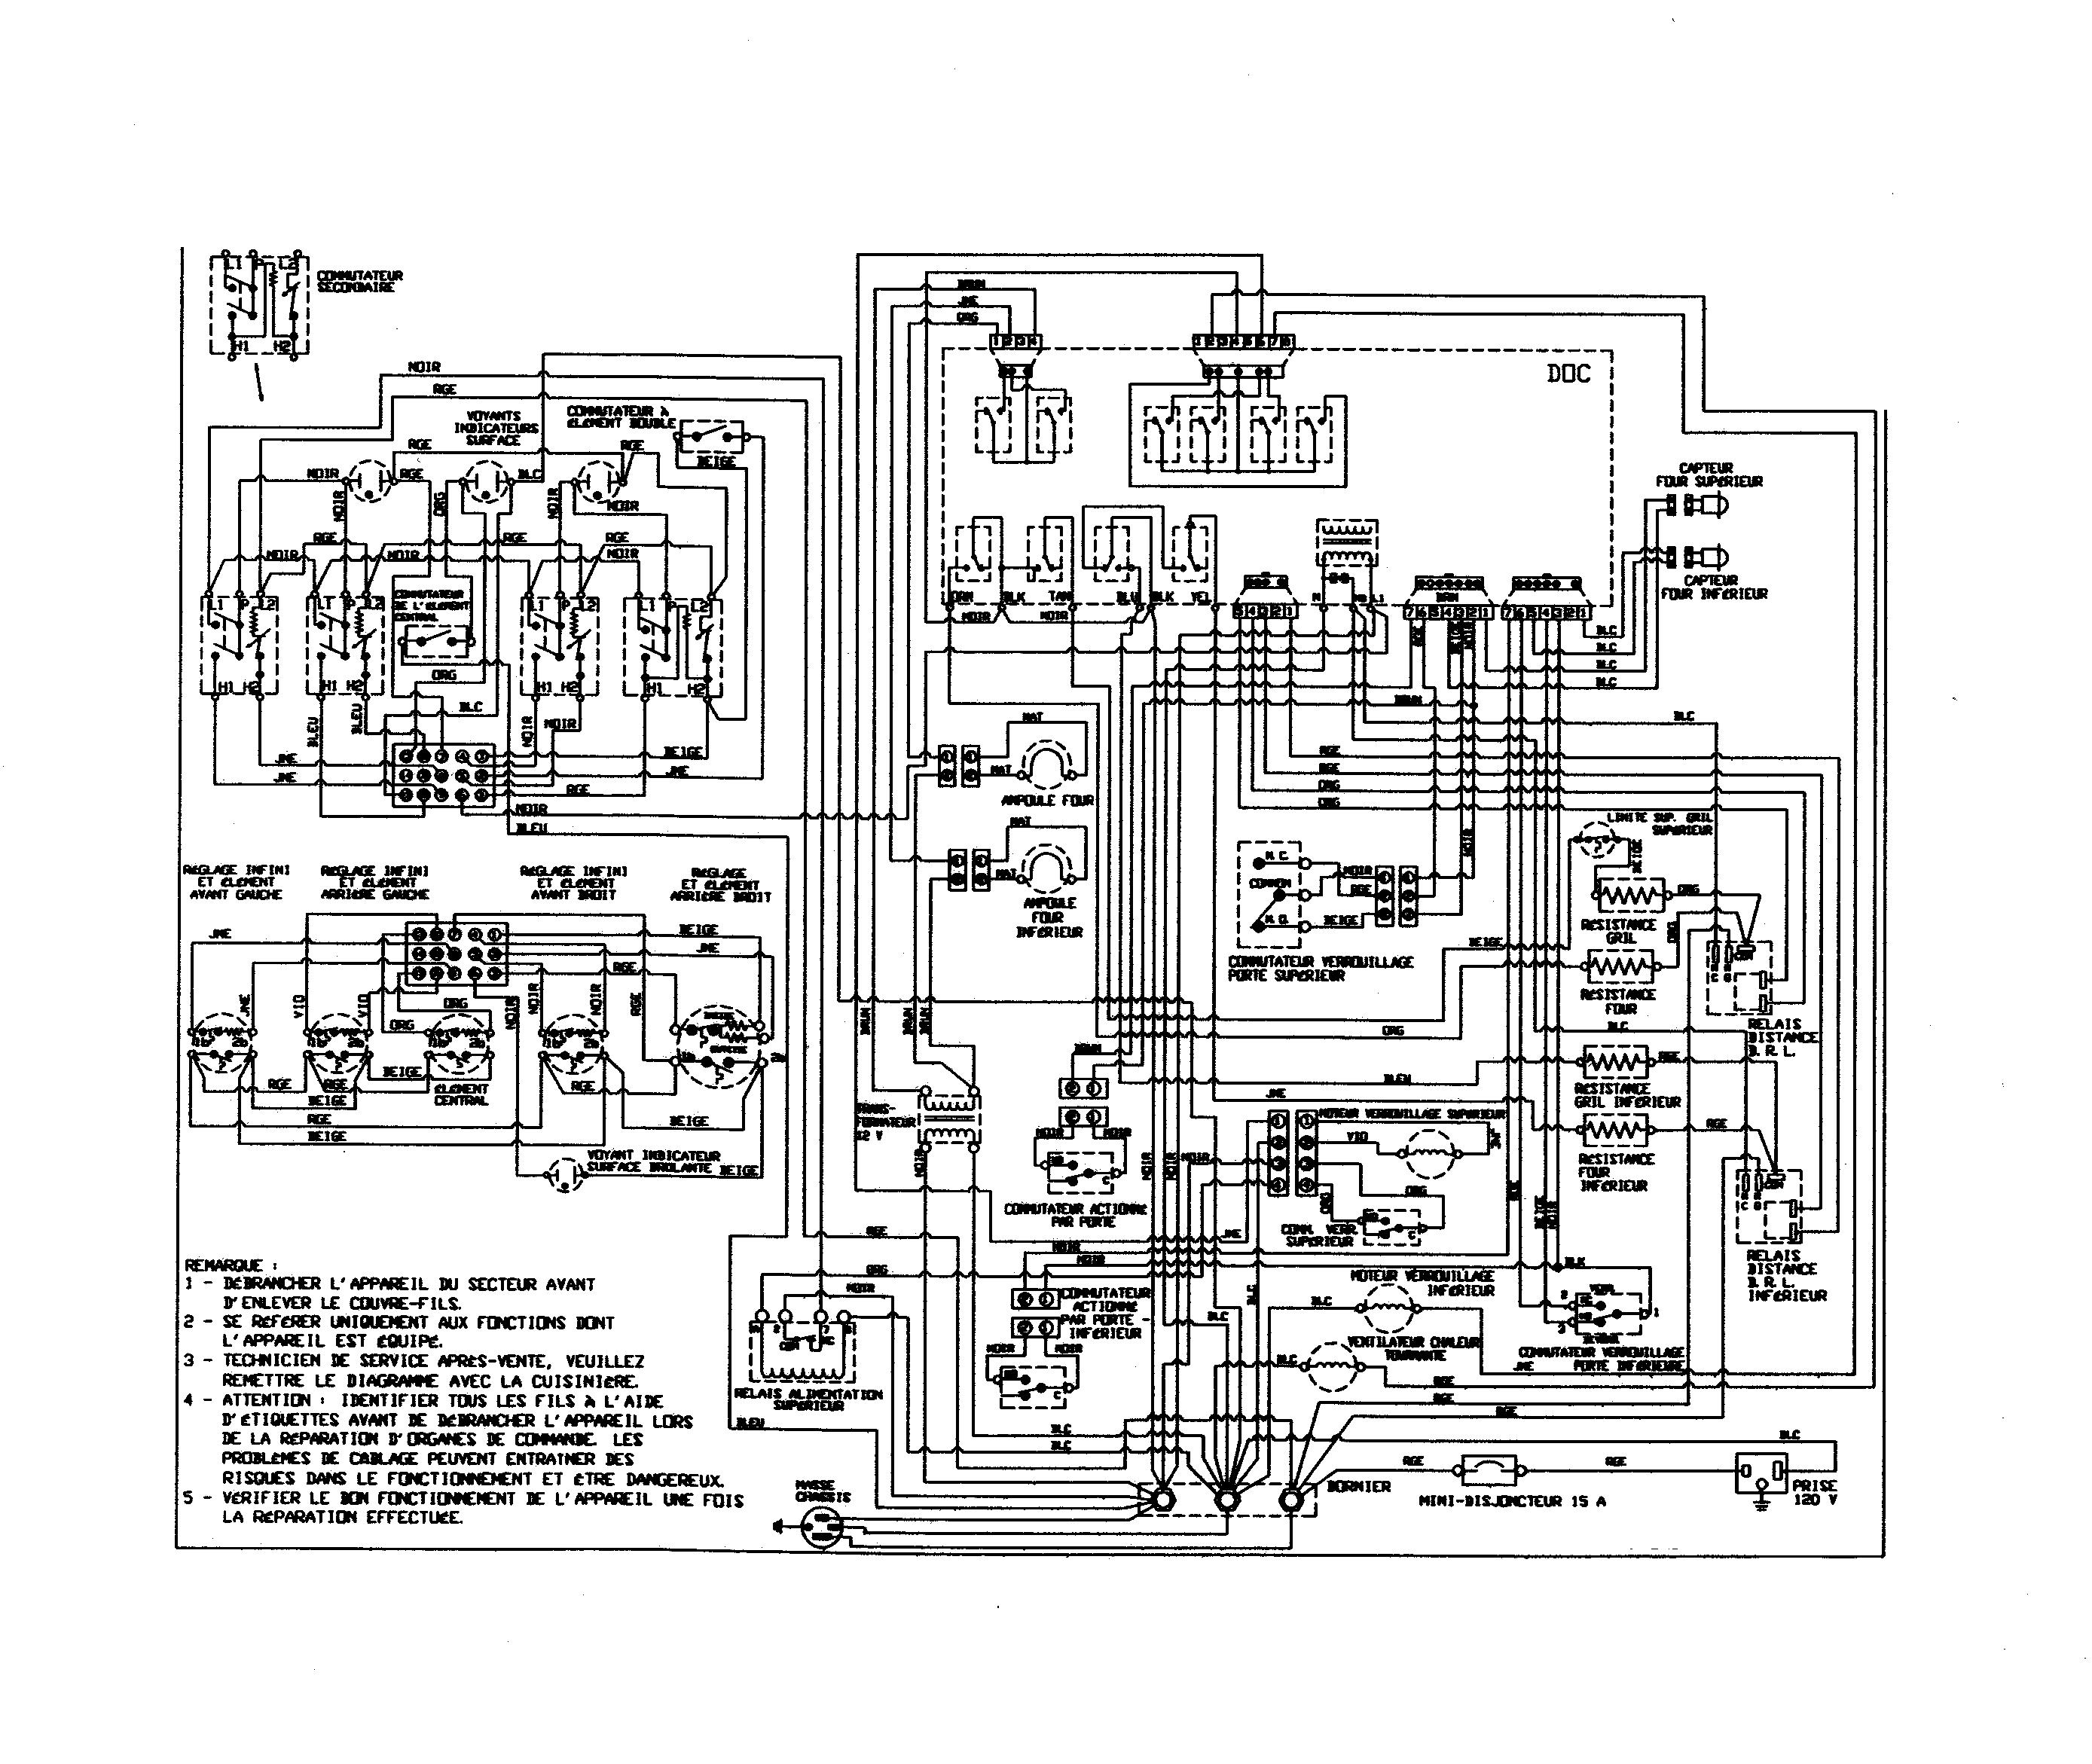 Maytag MER6772BCB Range Timer - Stove Clocks and Appliance